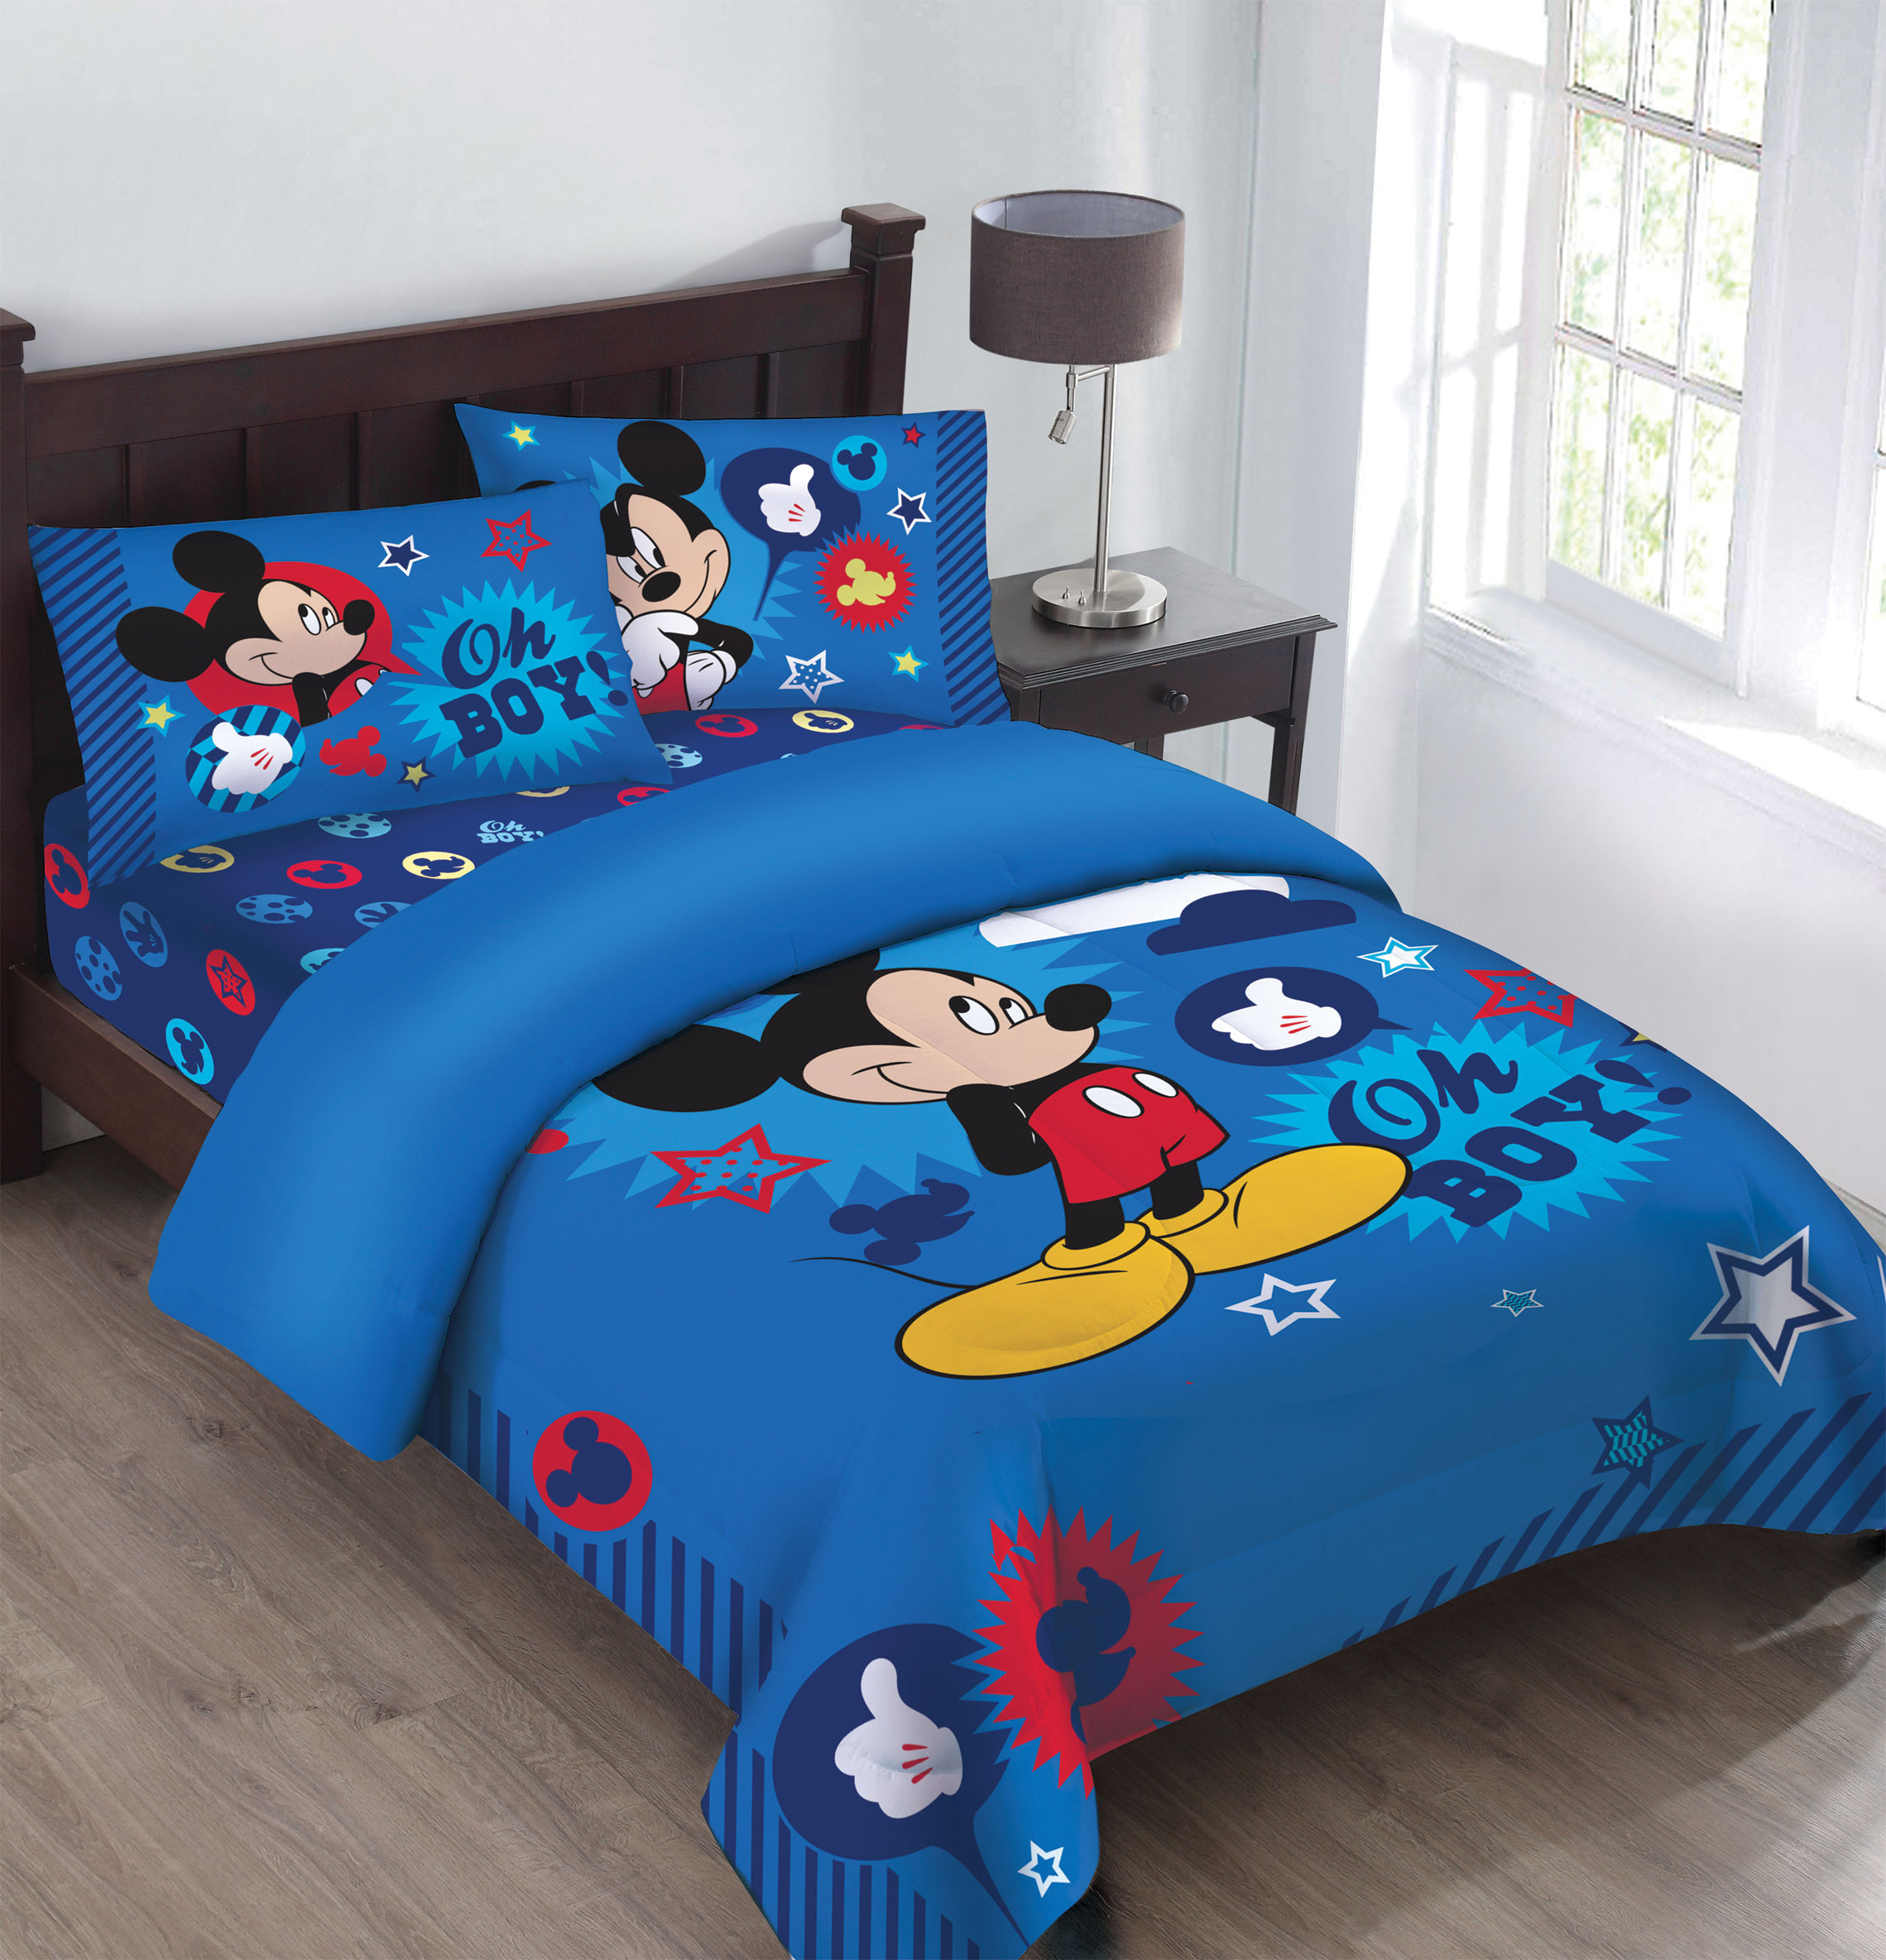 Disney Mickey Oh Boy! Gosh Licensed Comforter Set Set w/Fitted Sheet